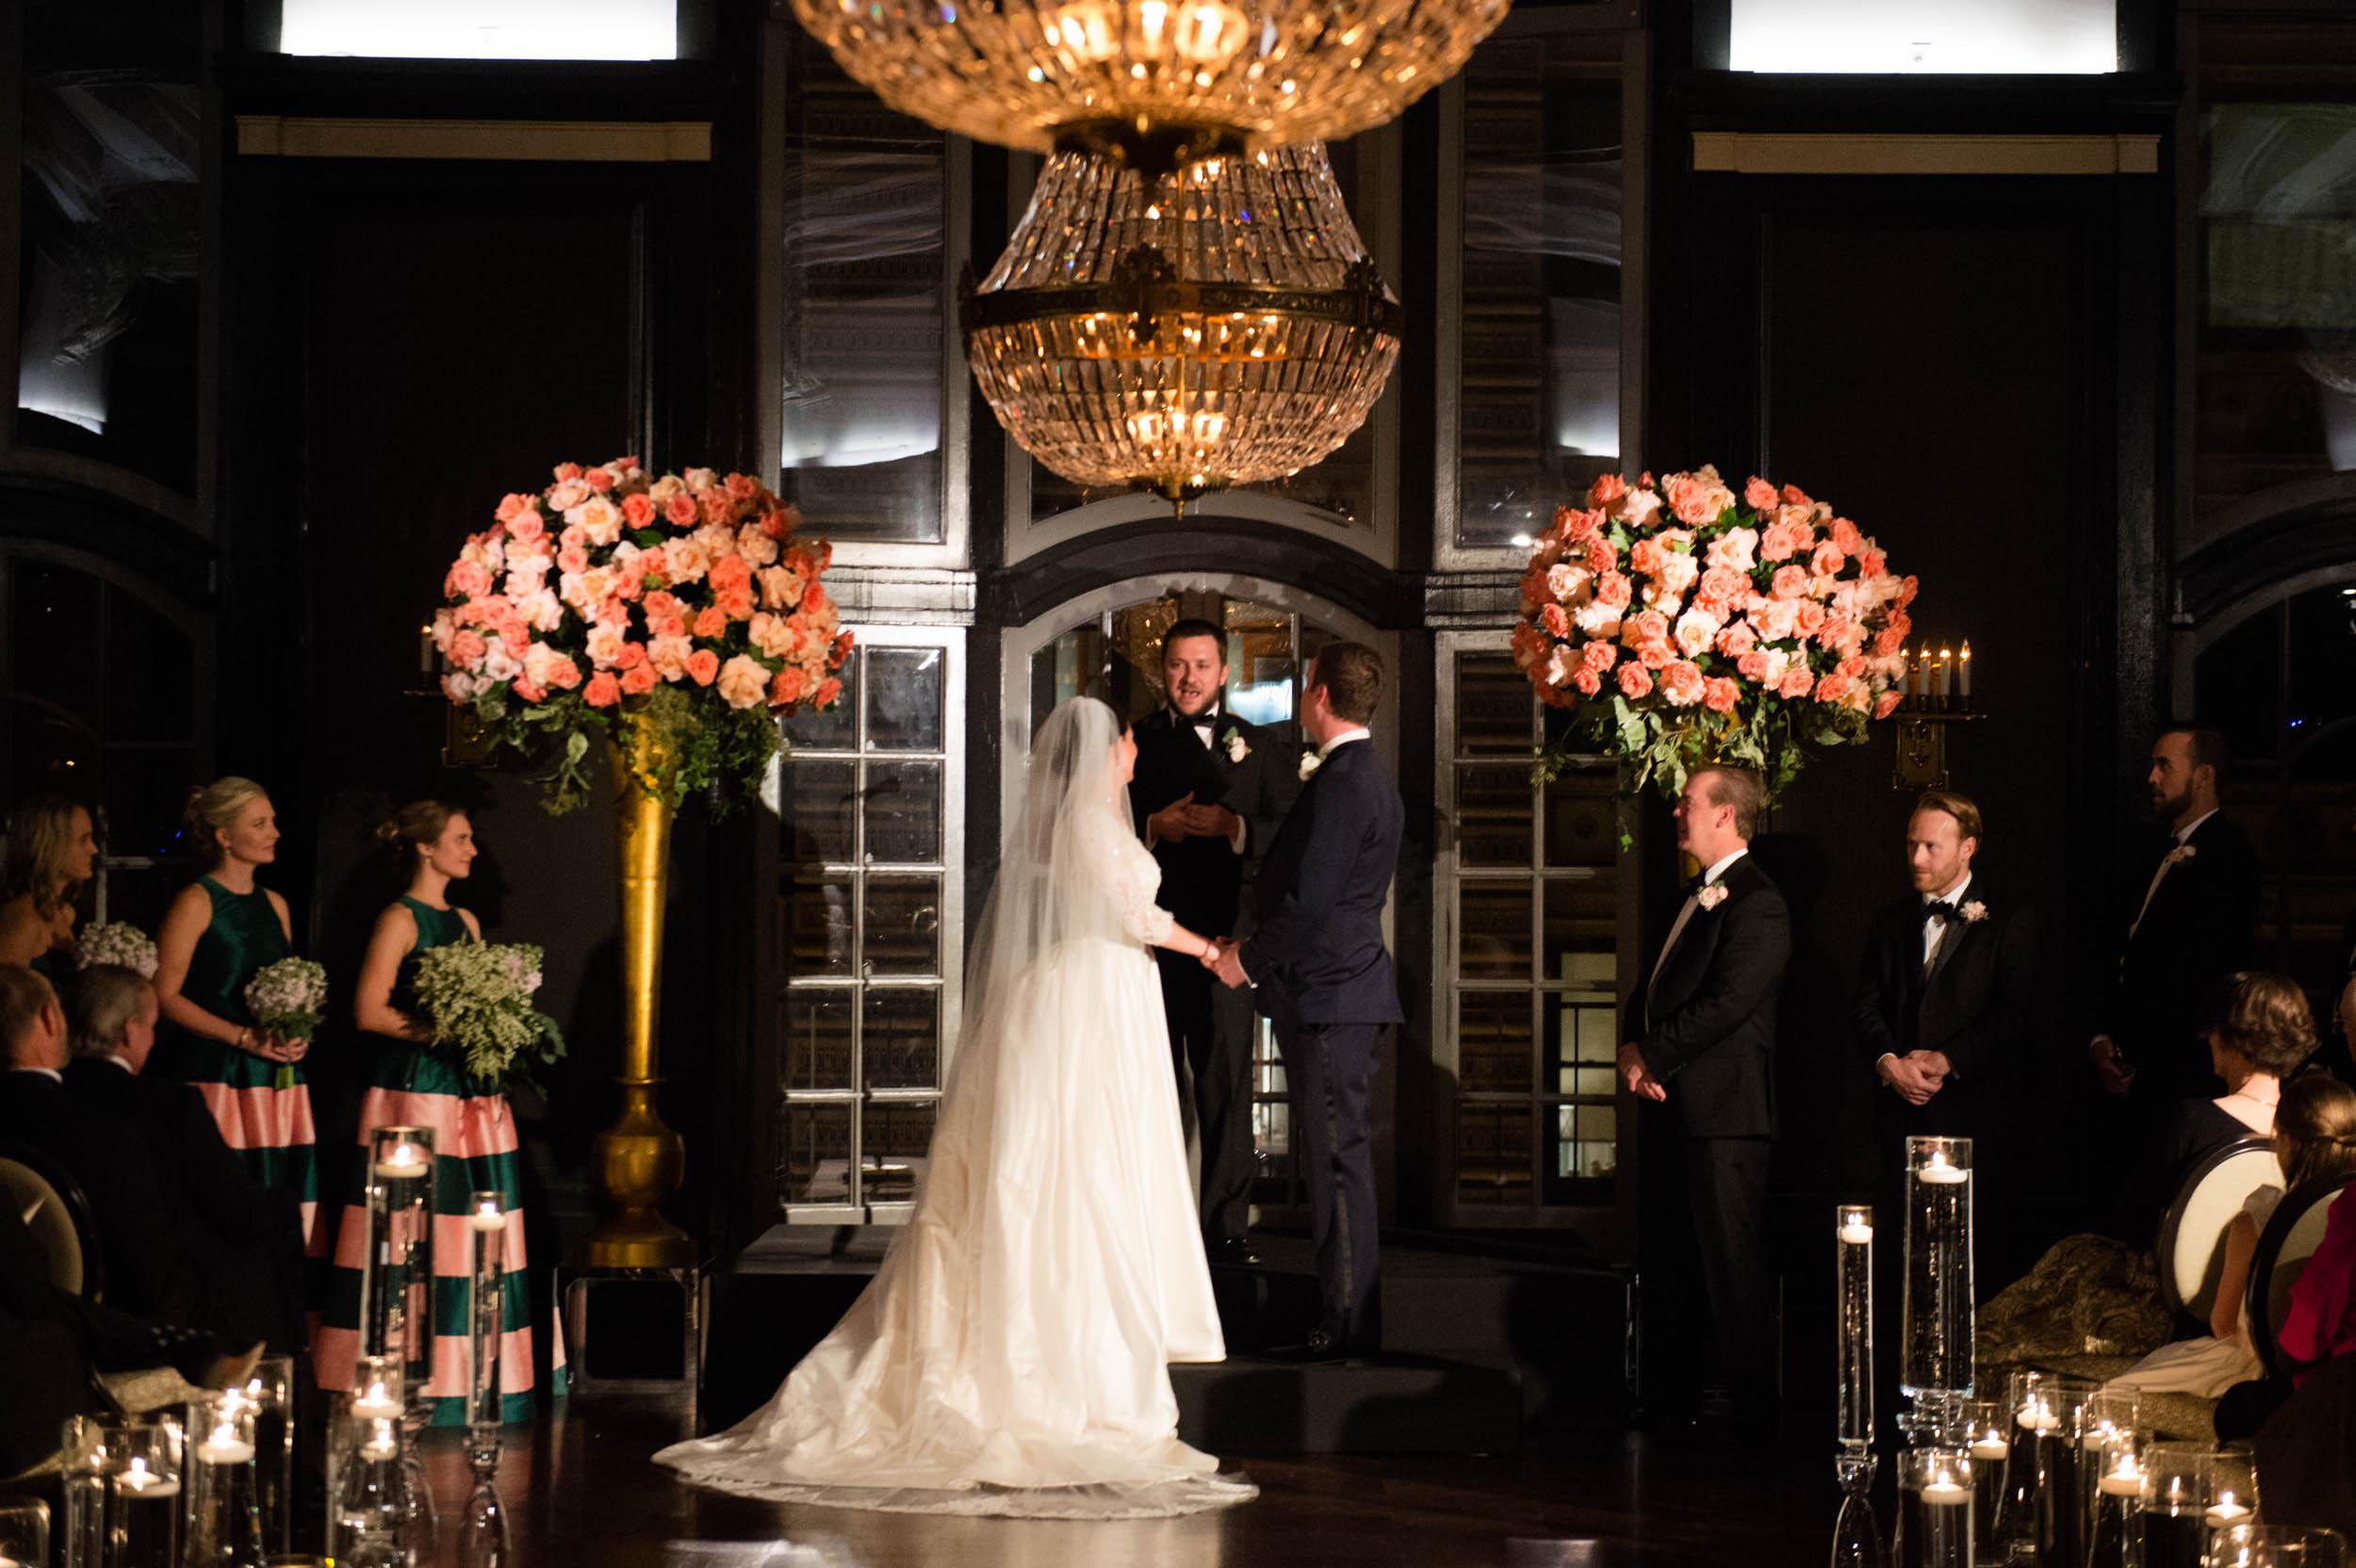 Wedding ceremony at Chicago Athletic Association Hotel